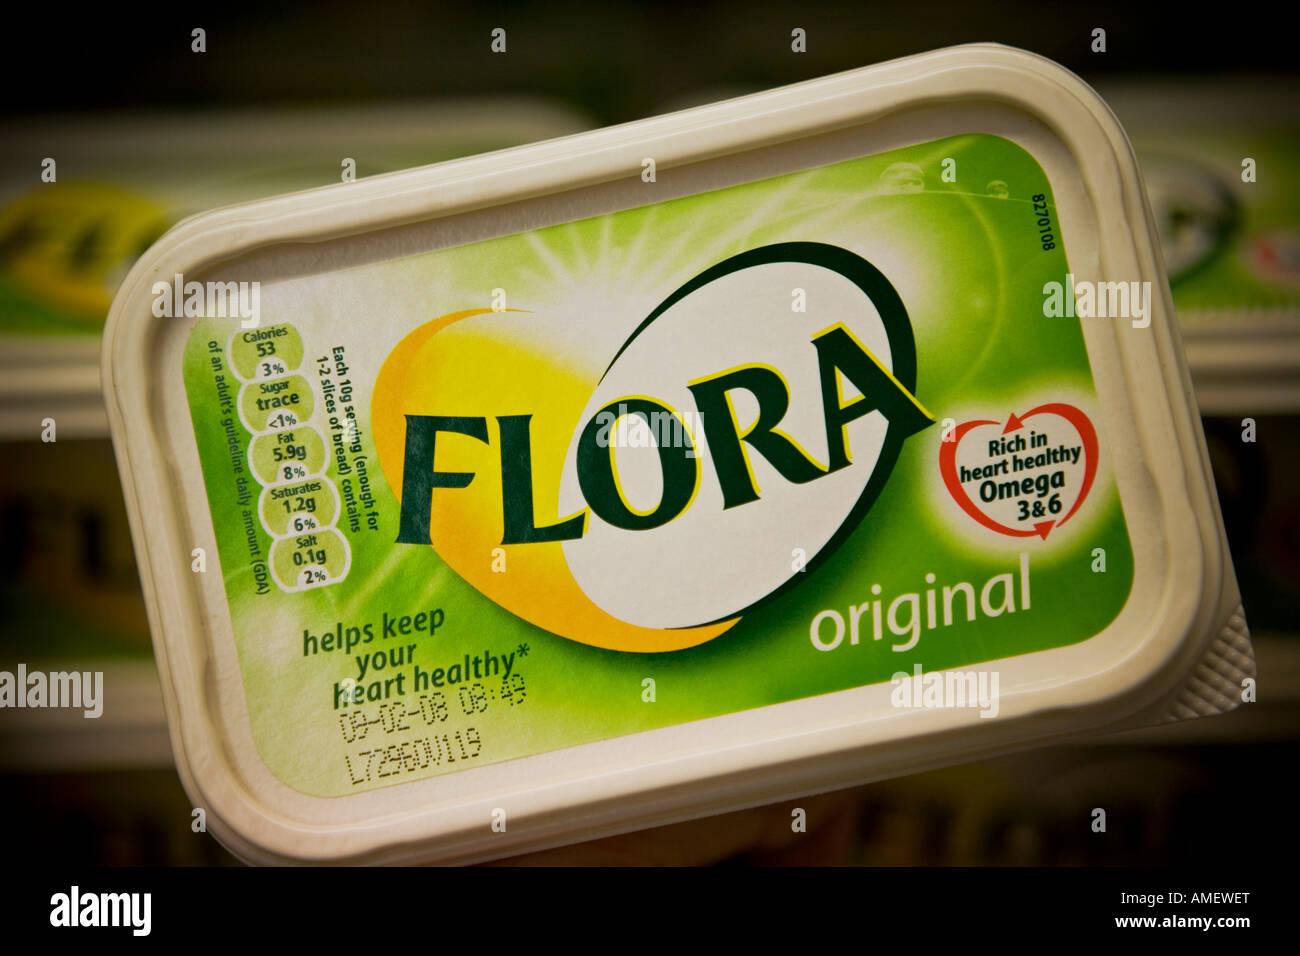 Flora spread Flora is a Unilever brand - Stock Image